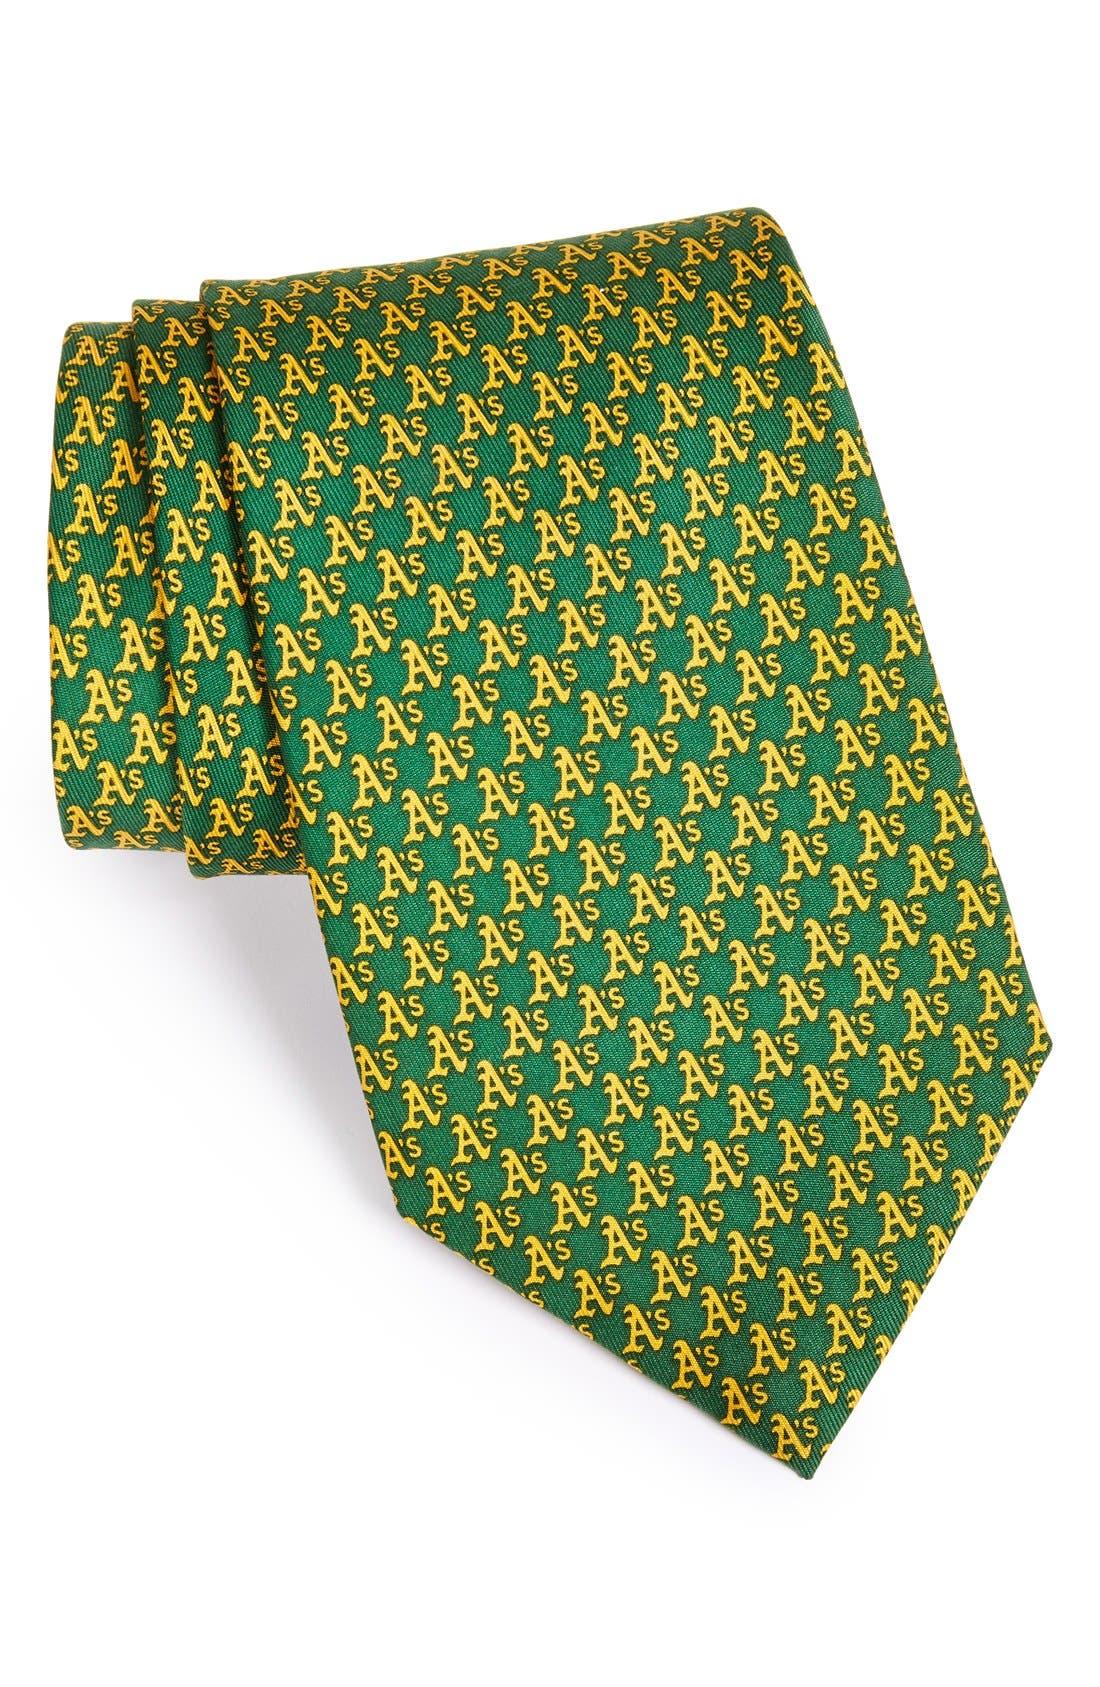 VINEYARD VINES,                             Oakland Athletics - MLB Woven Silk Tie,                             Main thumbnail 1, color,                             315